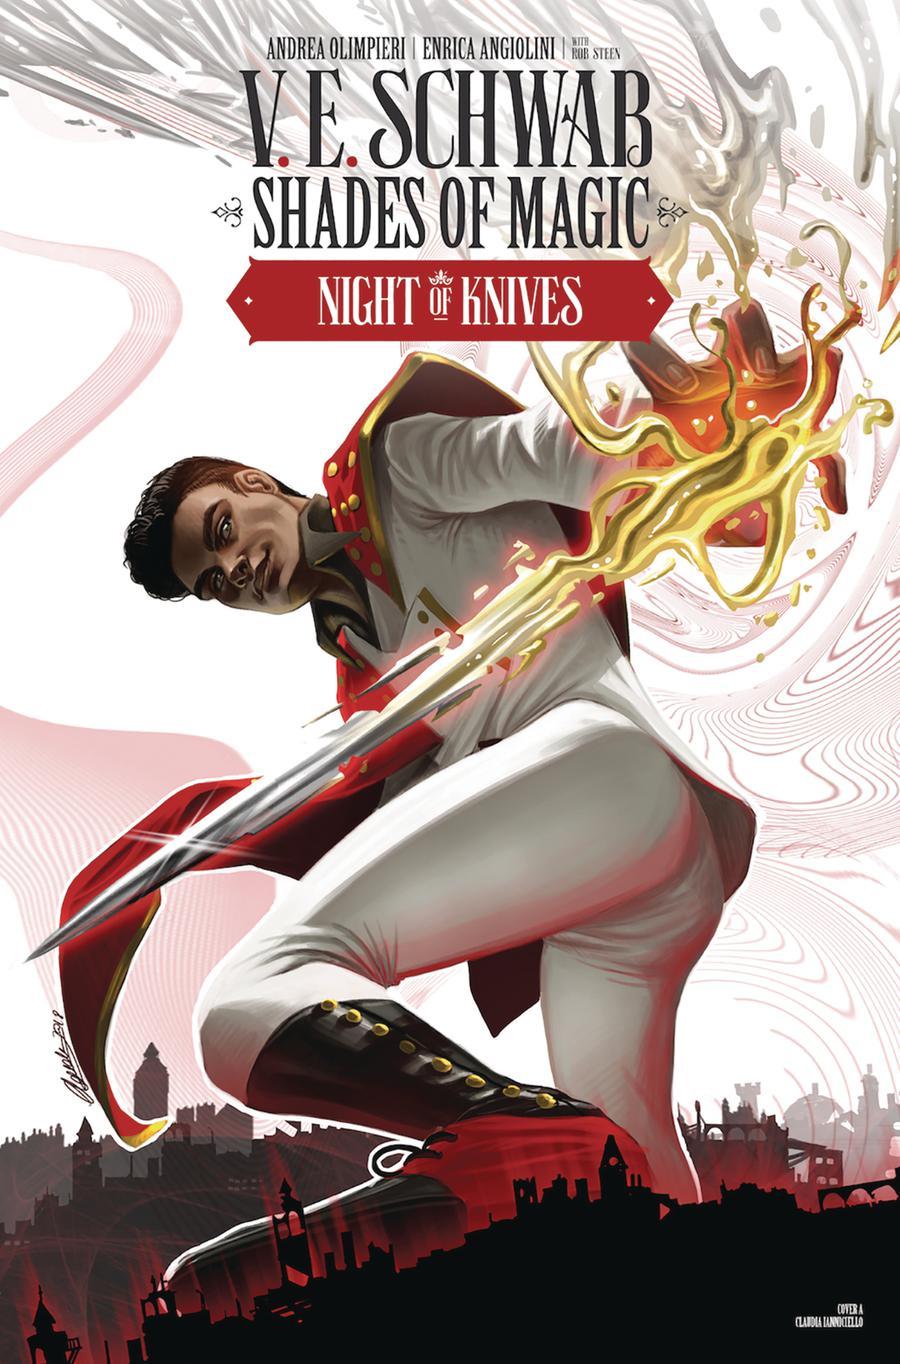 Shades Of Magic #5 Night Of Knives Cover A Regular Claudia Ianniciello Cover